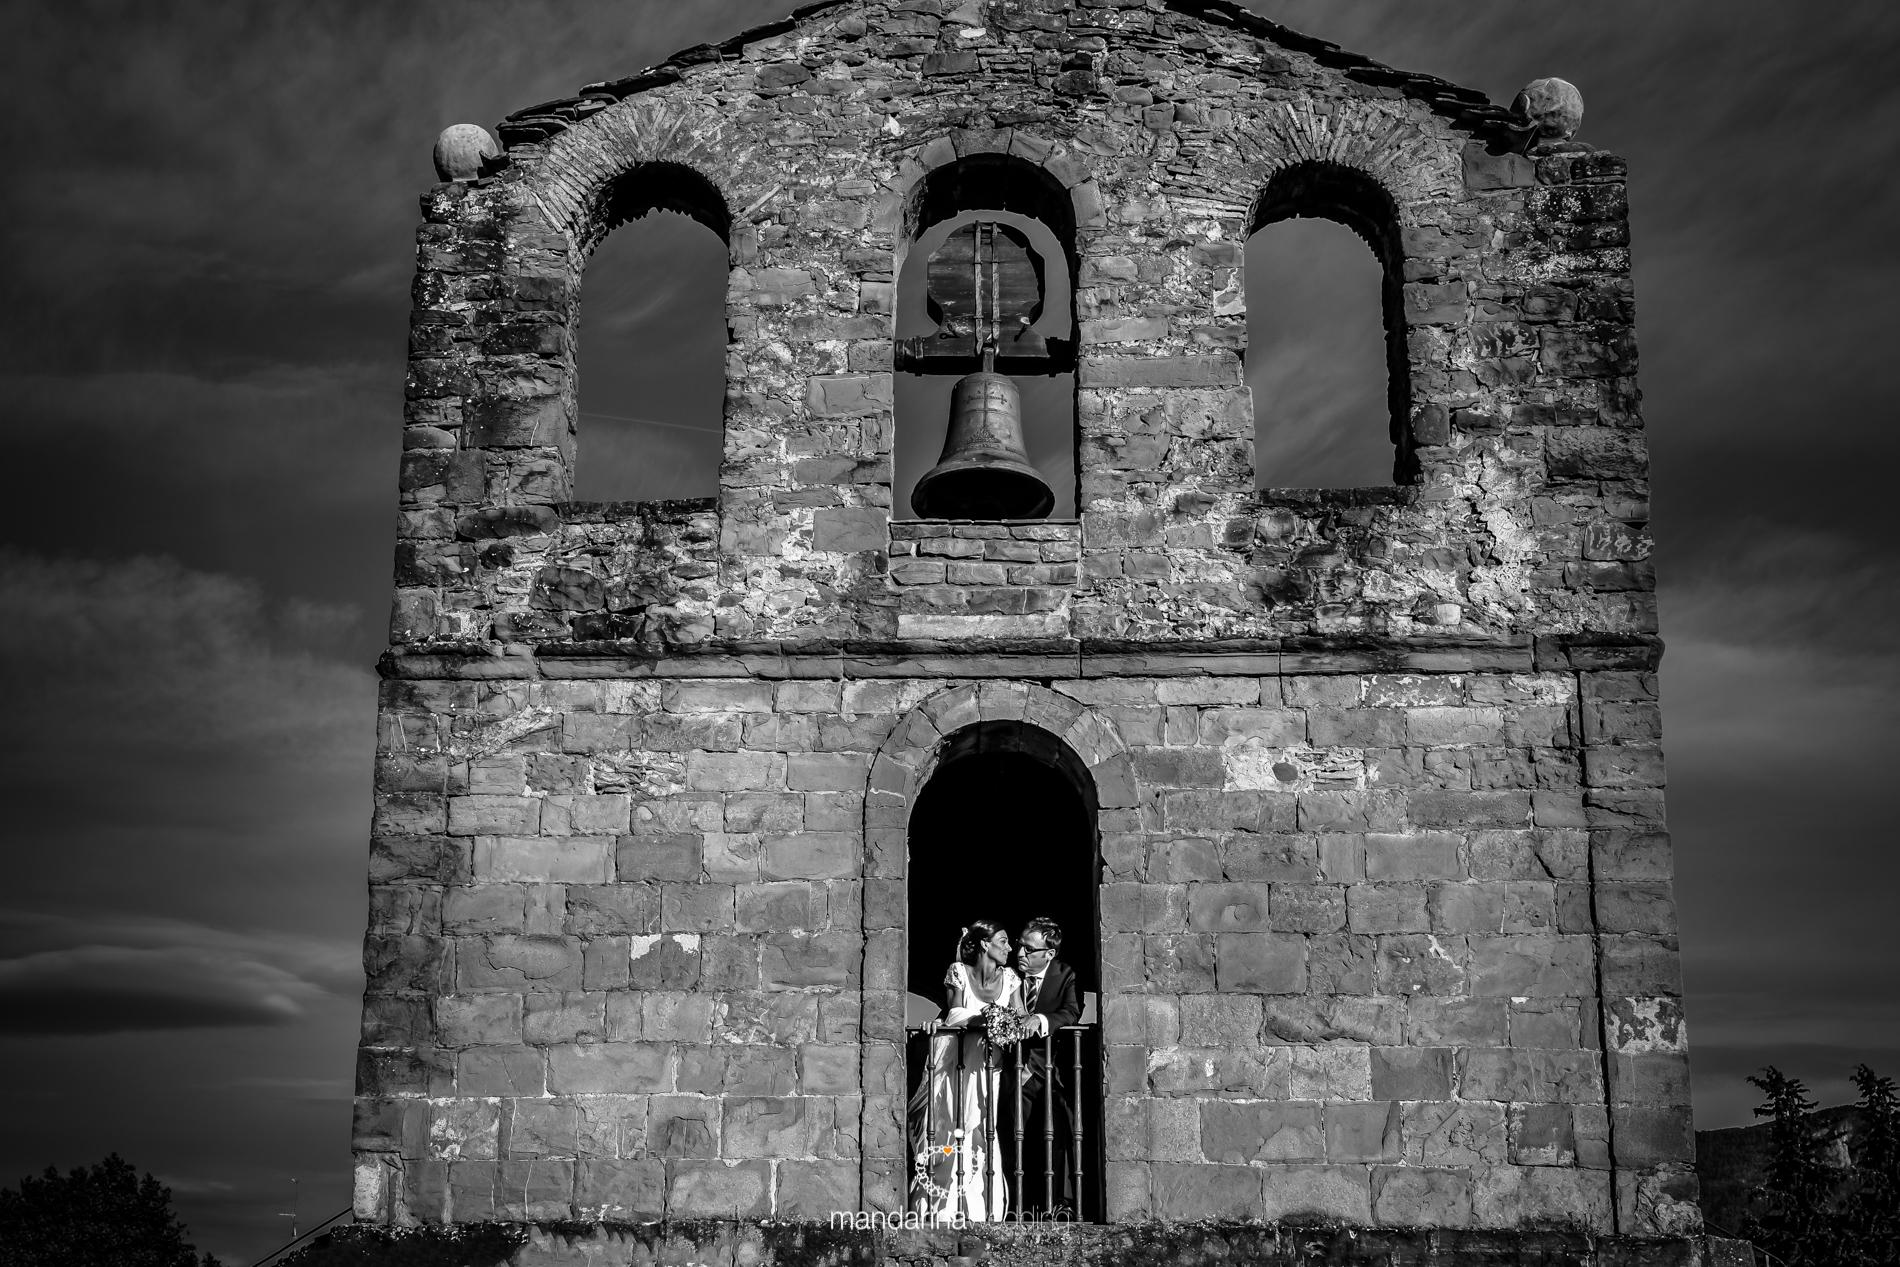 mandaria wedding, fotografos de boda, fotoperiodismo de boda, mejores fotografos de boda, bodas soria, bodas pirineo, bodas Madrid, fotógrafos tarragona_12